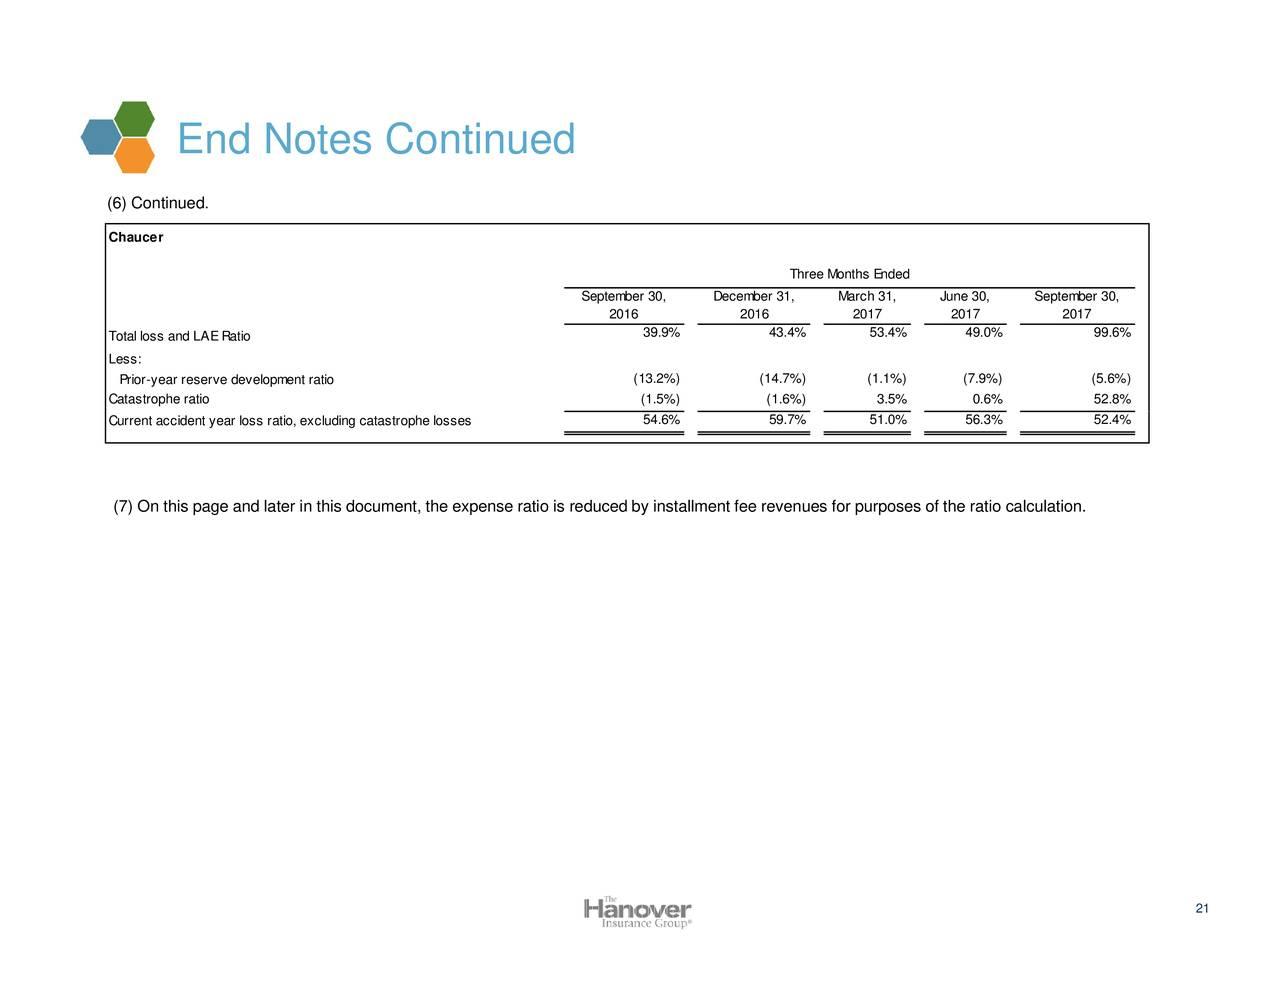 Insurance Expense Ratio Calculation